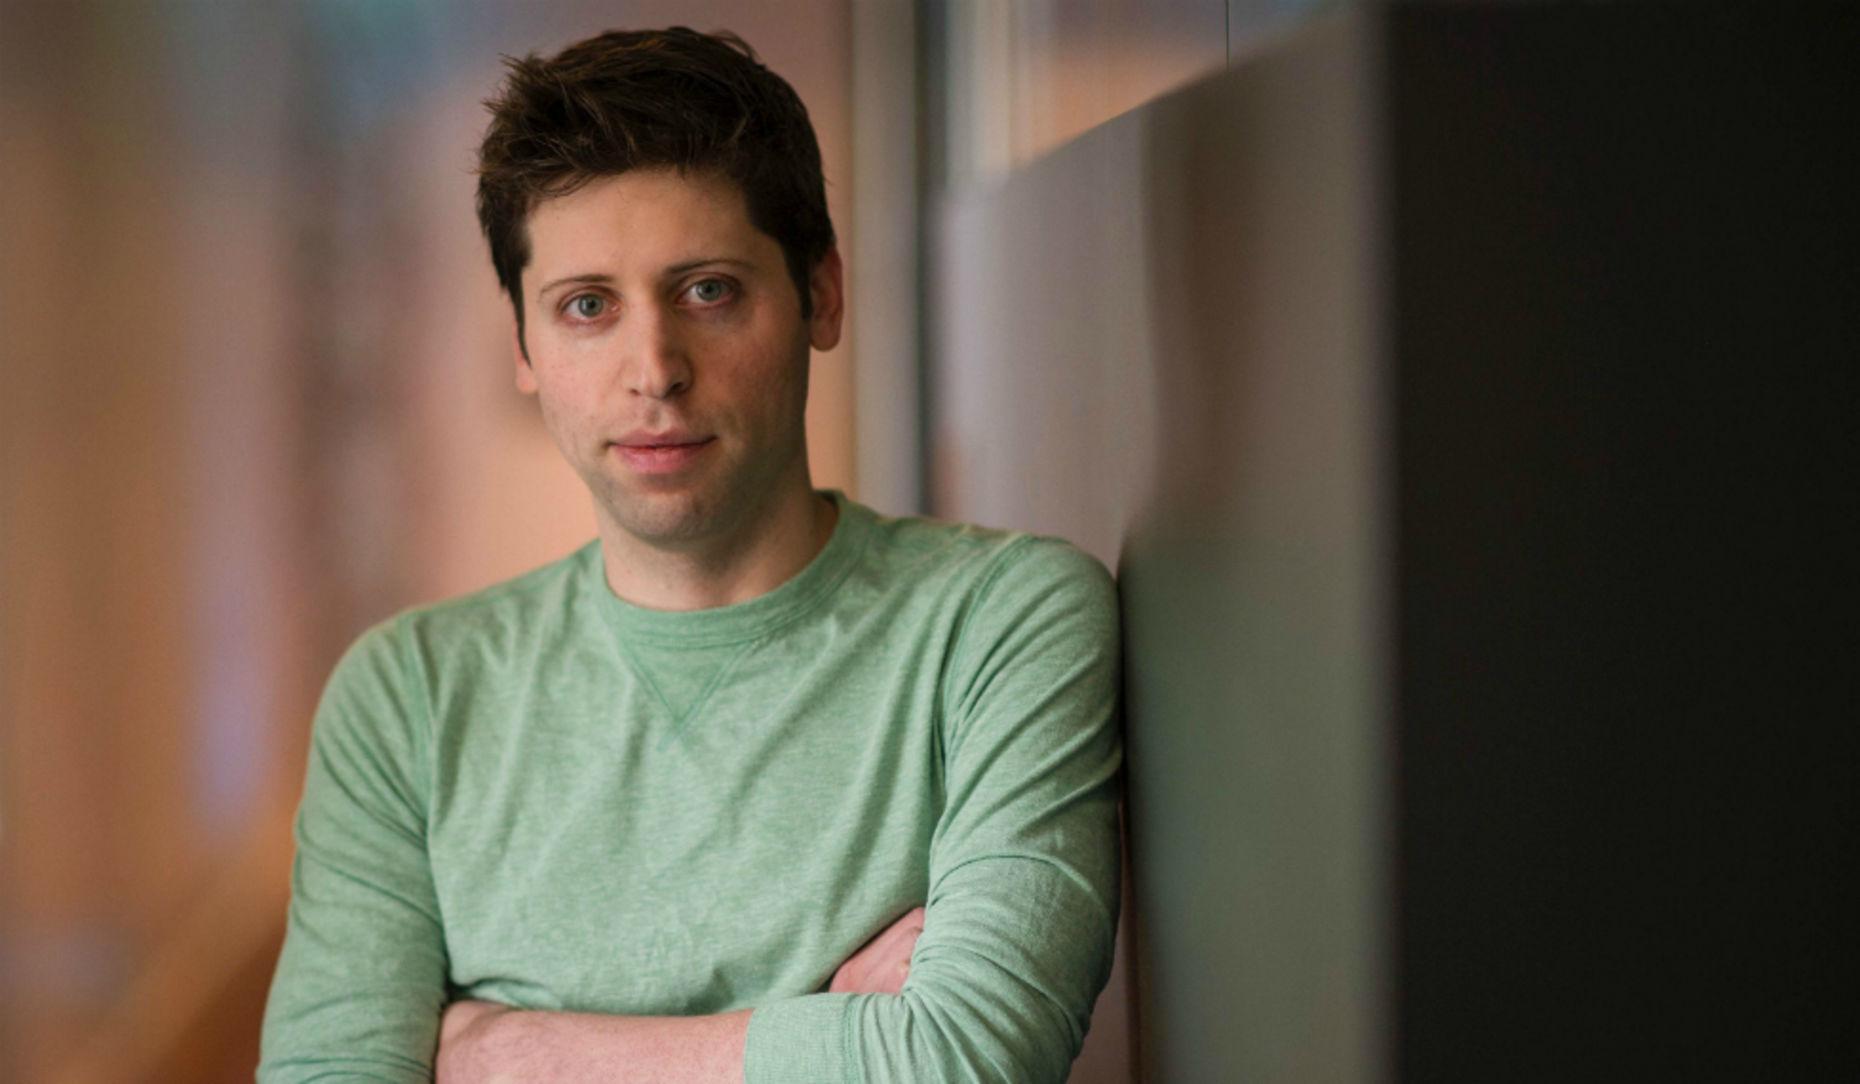 Y Combinator President Sam Altman. Photo by Bloomberg.